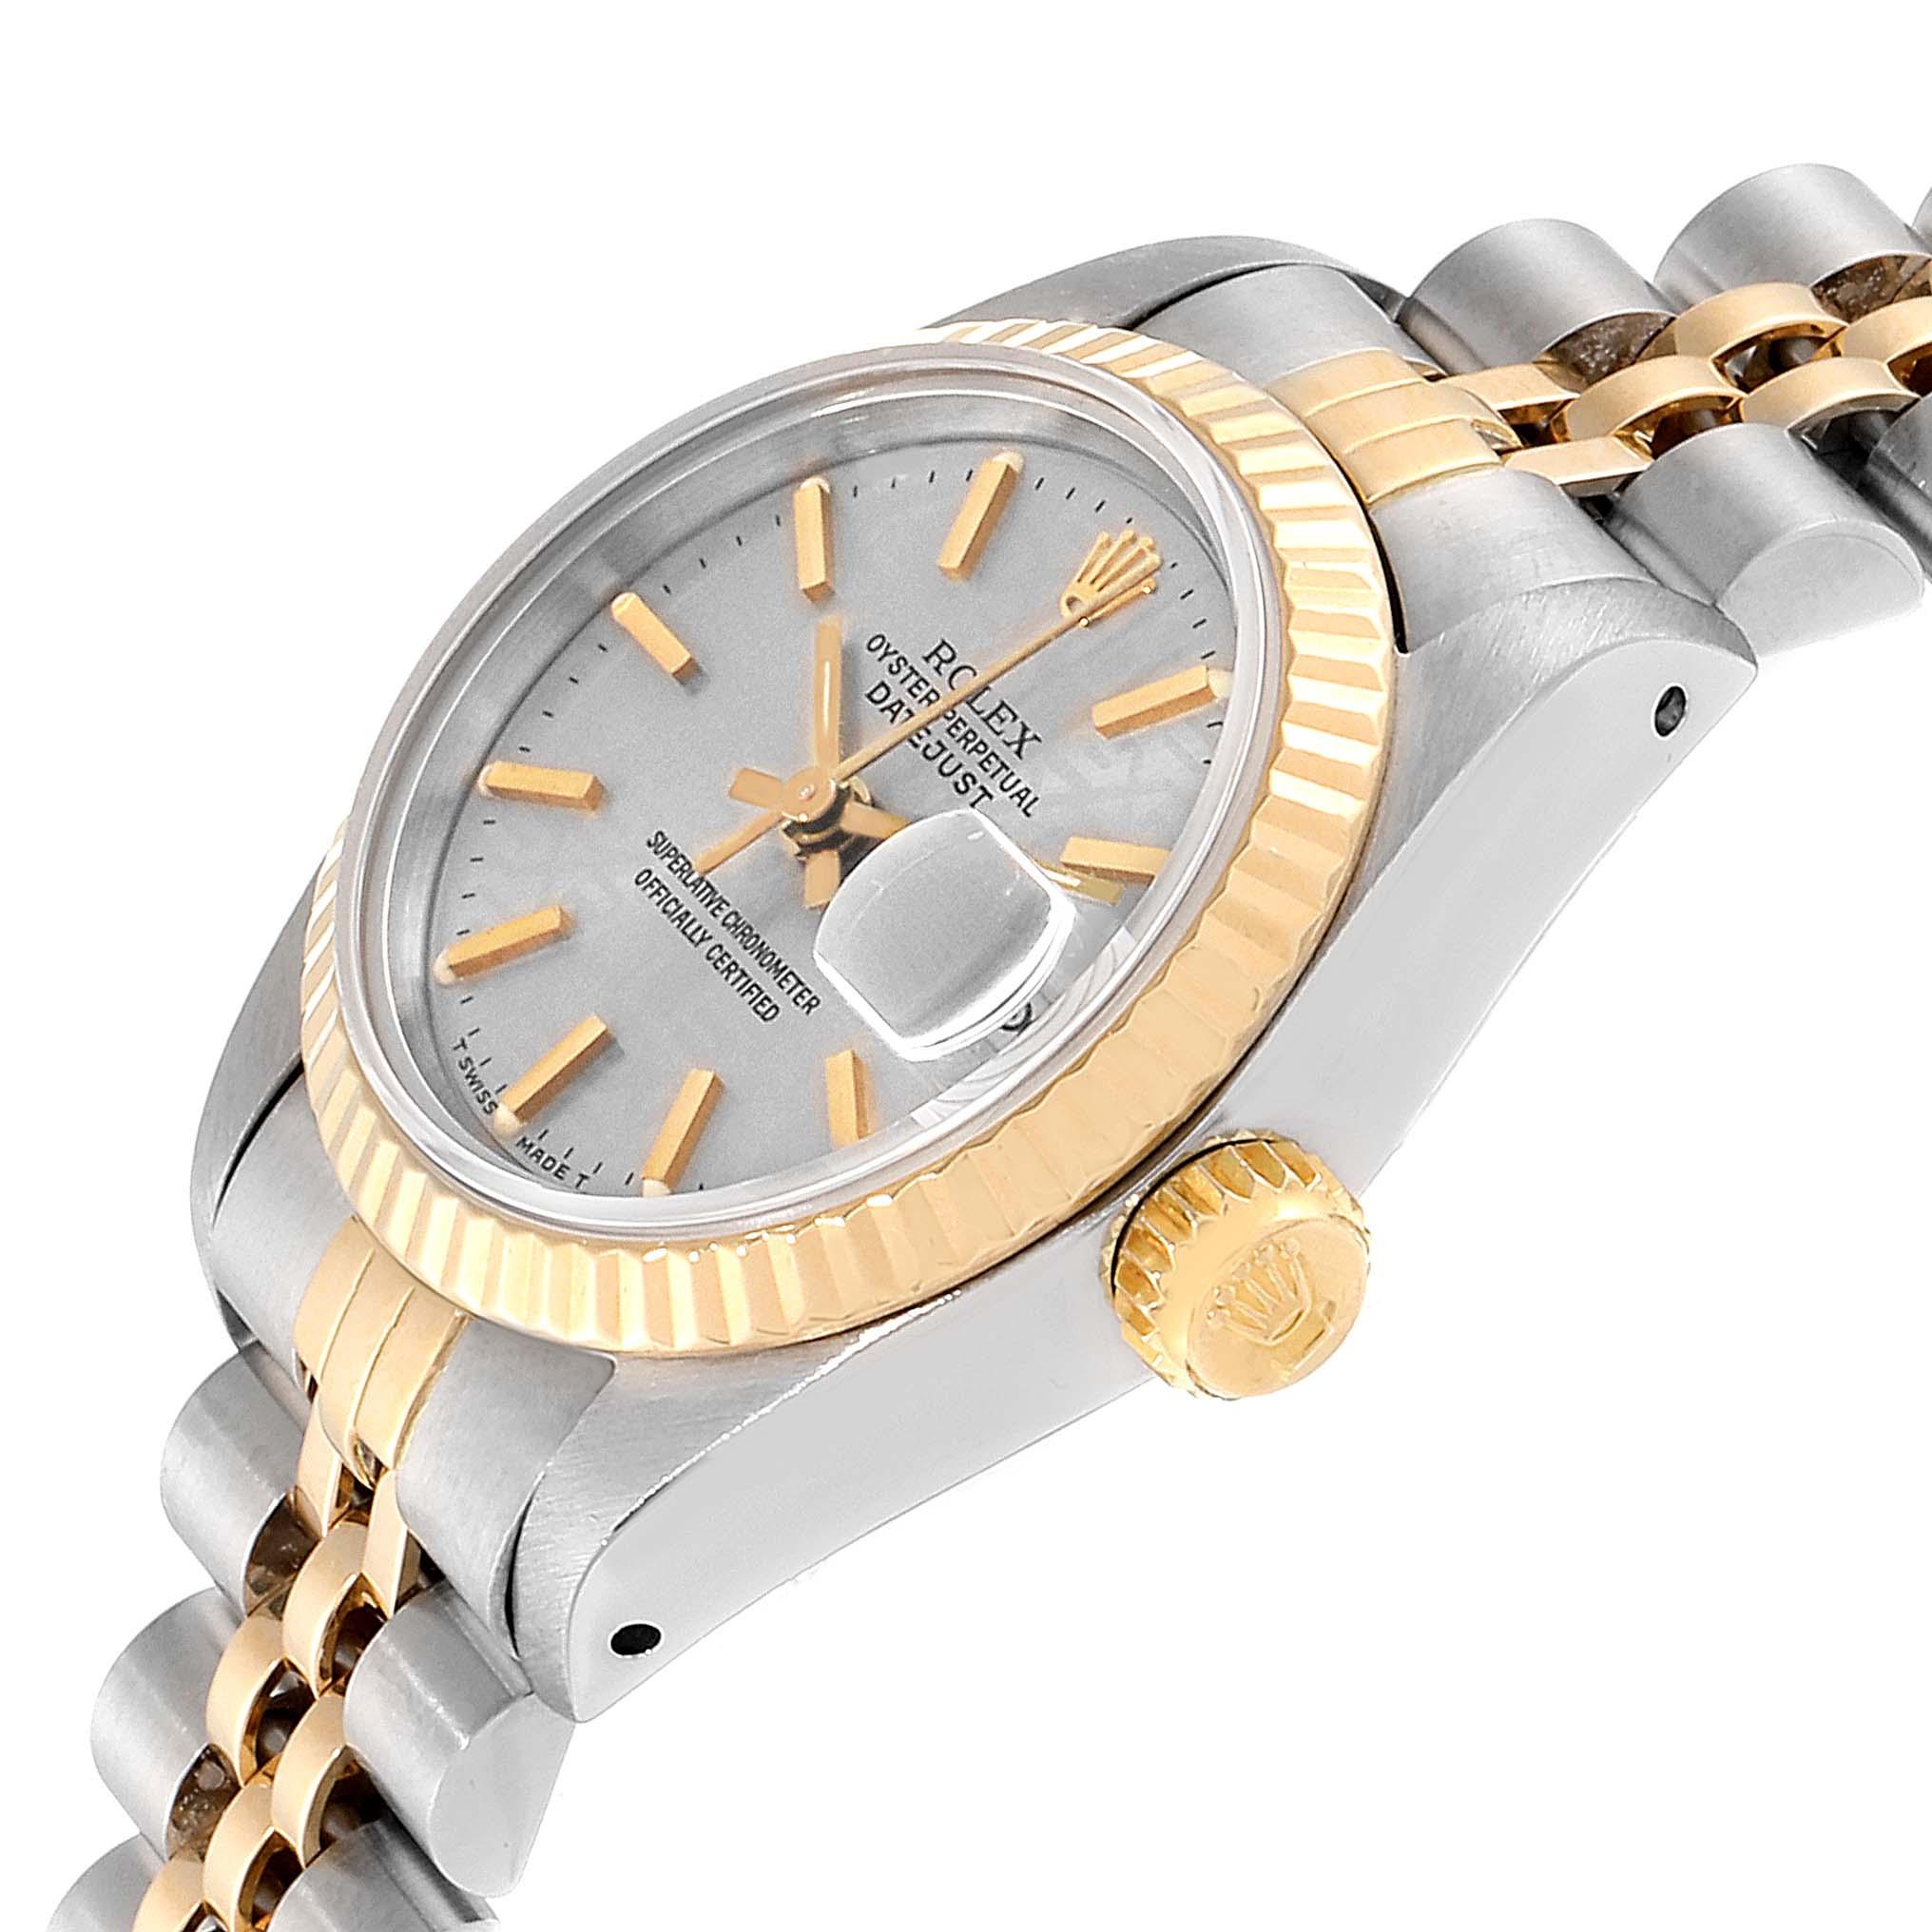 Rolex Datejust Steel Yellow Gold Anniversary Dial Ladies Watch 69173 SwissWatchExpo